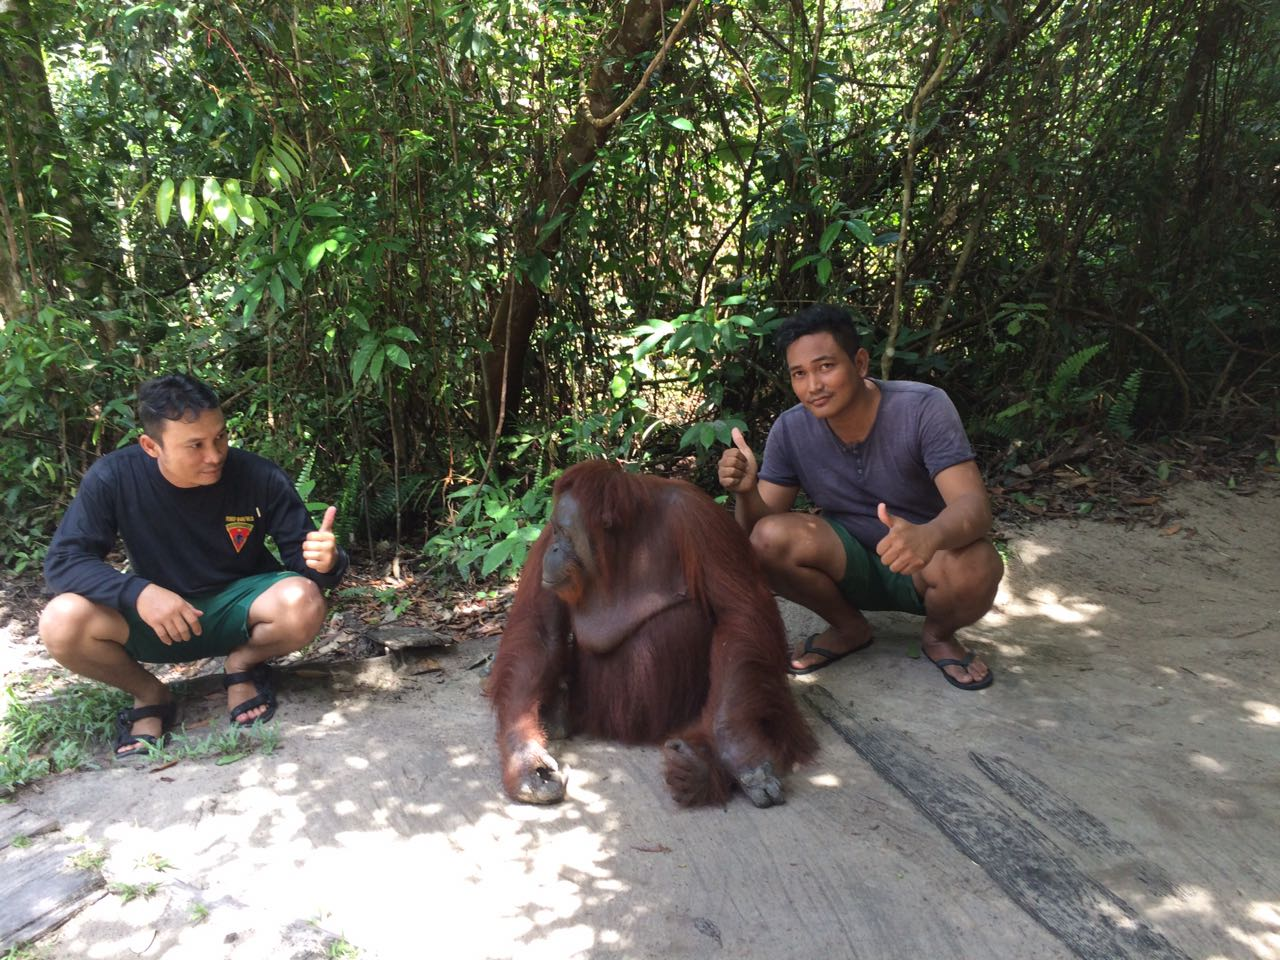 Prajurit TNI Kodim 1014, Pangkalan BUN tengah berinteraksi dengan orangutan (Foto: Sigit Dzakwan)